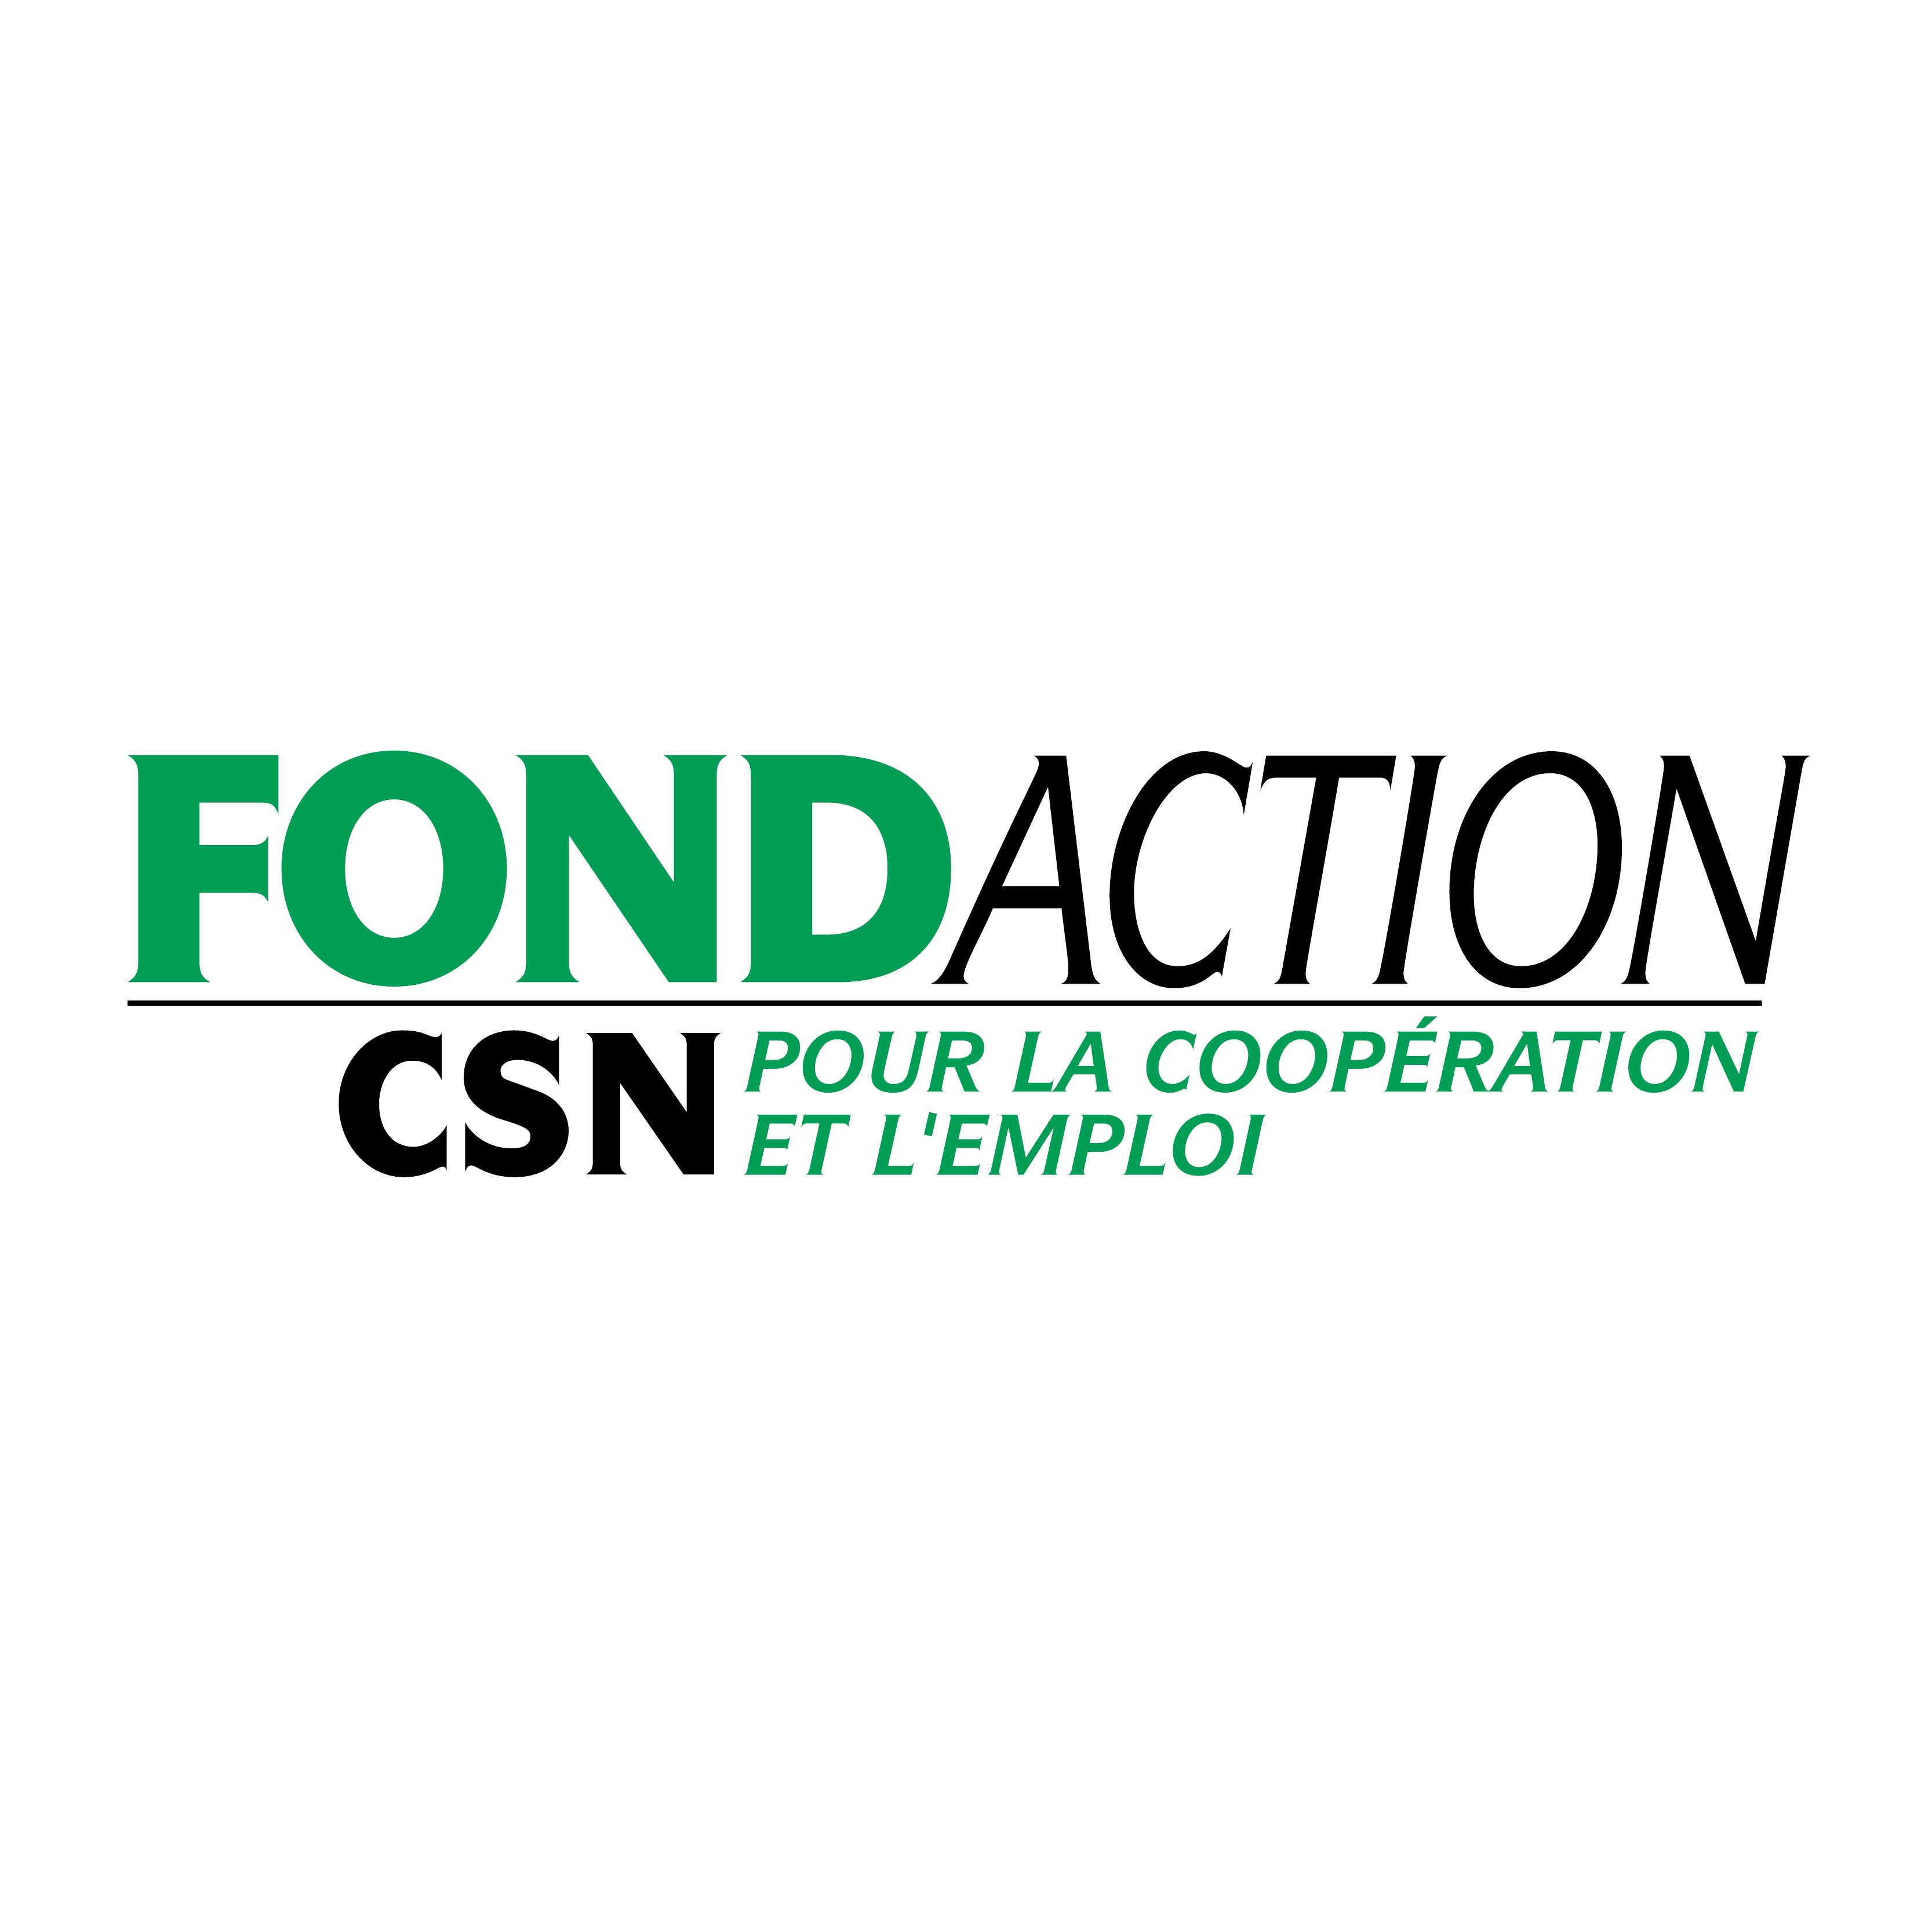 csn-fondaction_LOGO